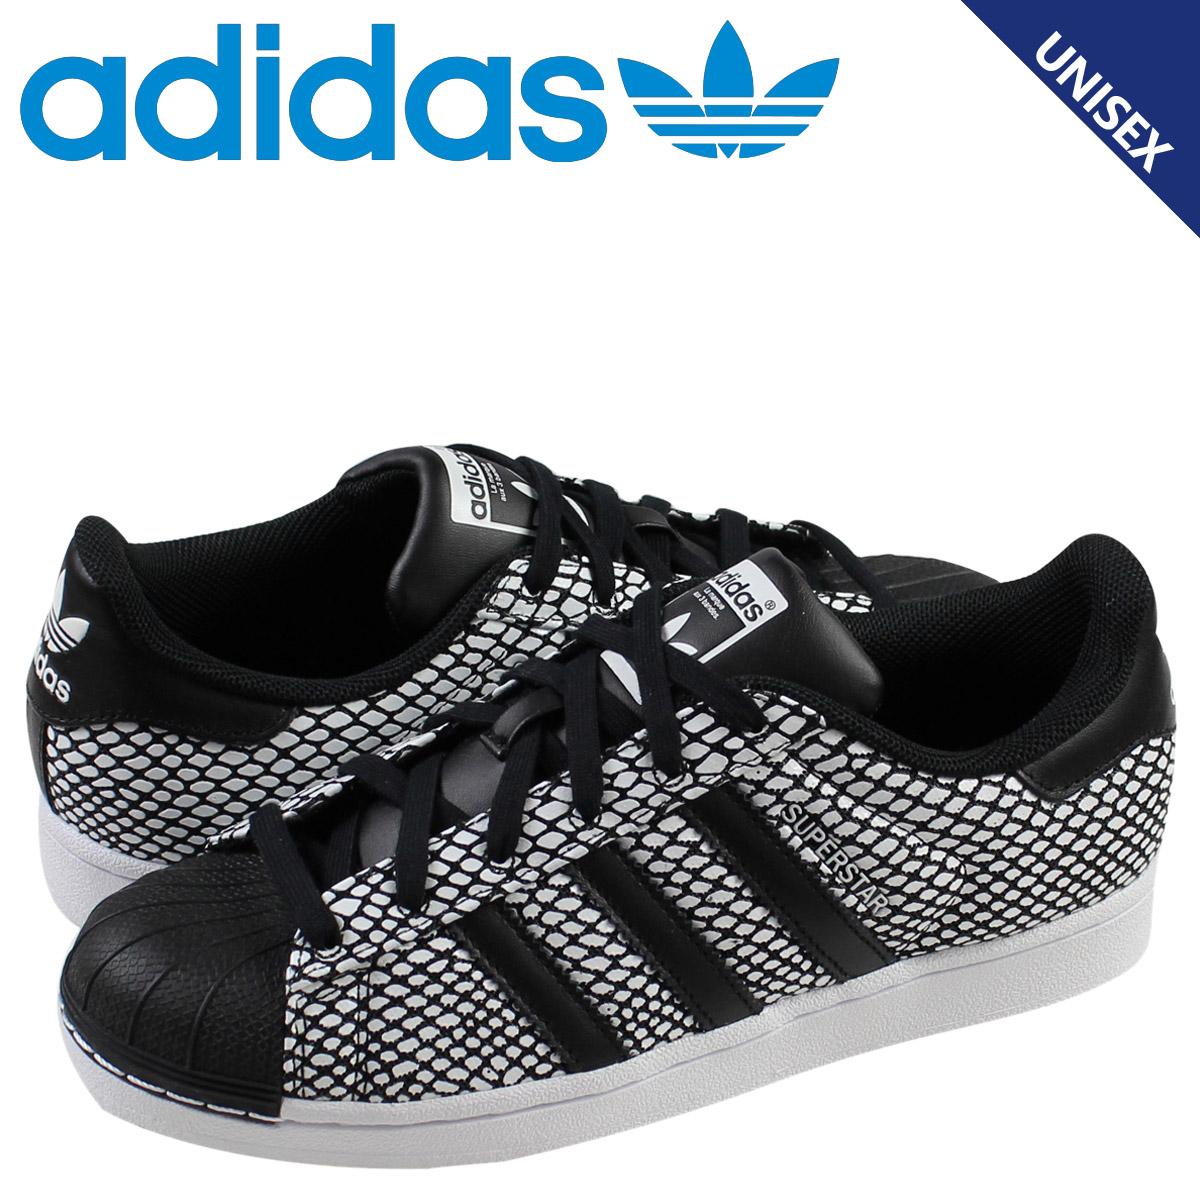 Sneak Online Shop Adidas Originals Adidas Originals Mens